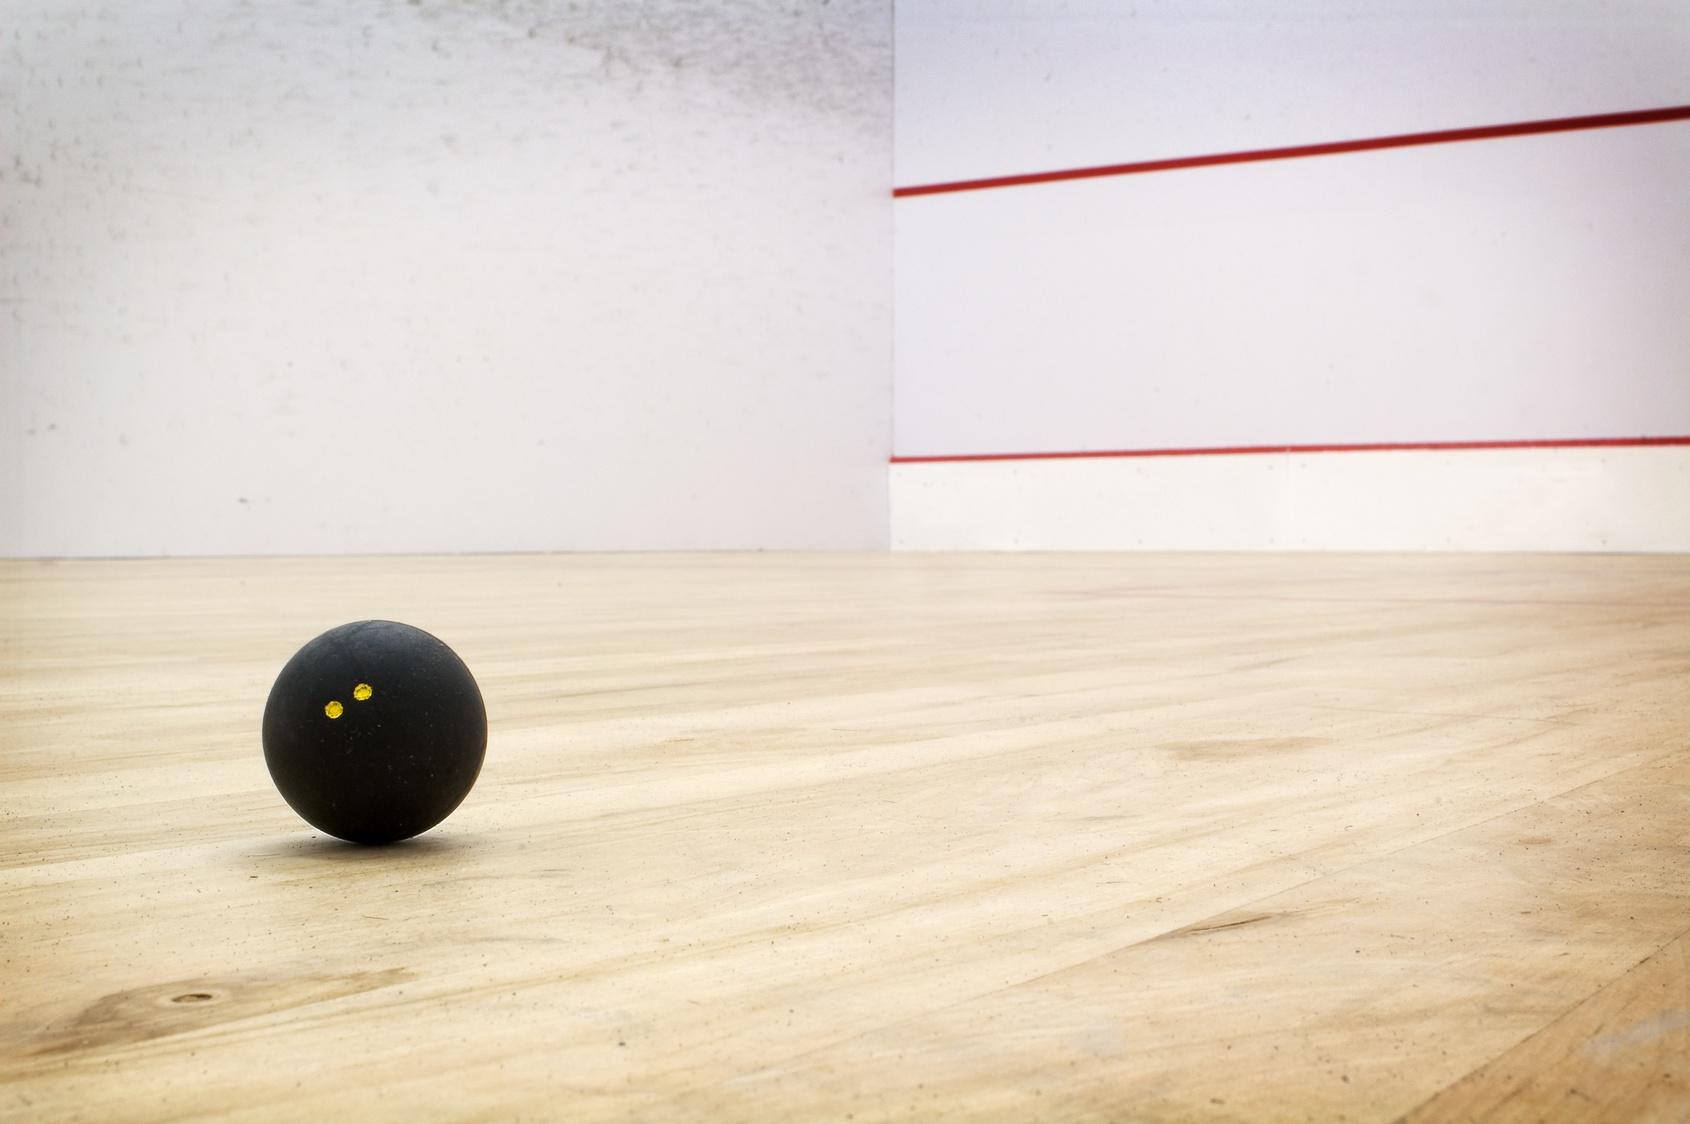 squash-court-floor.jpeg